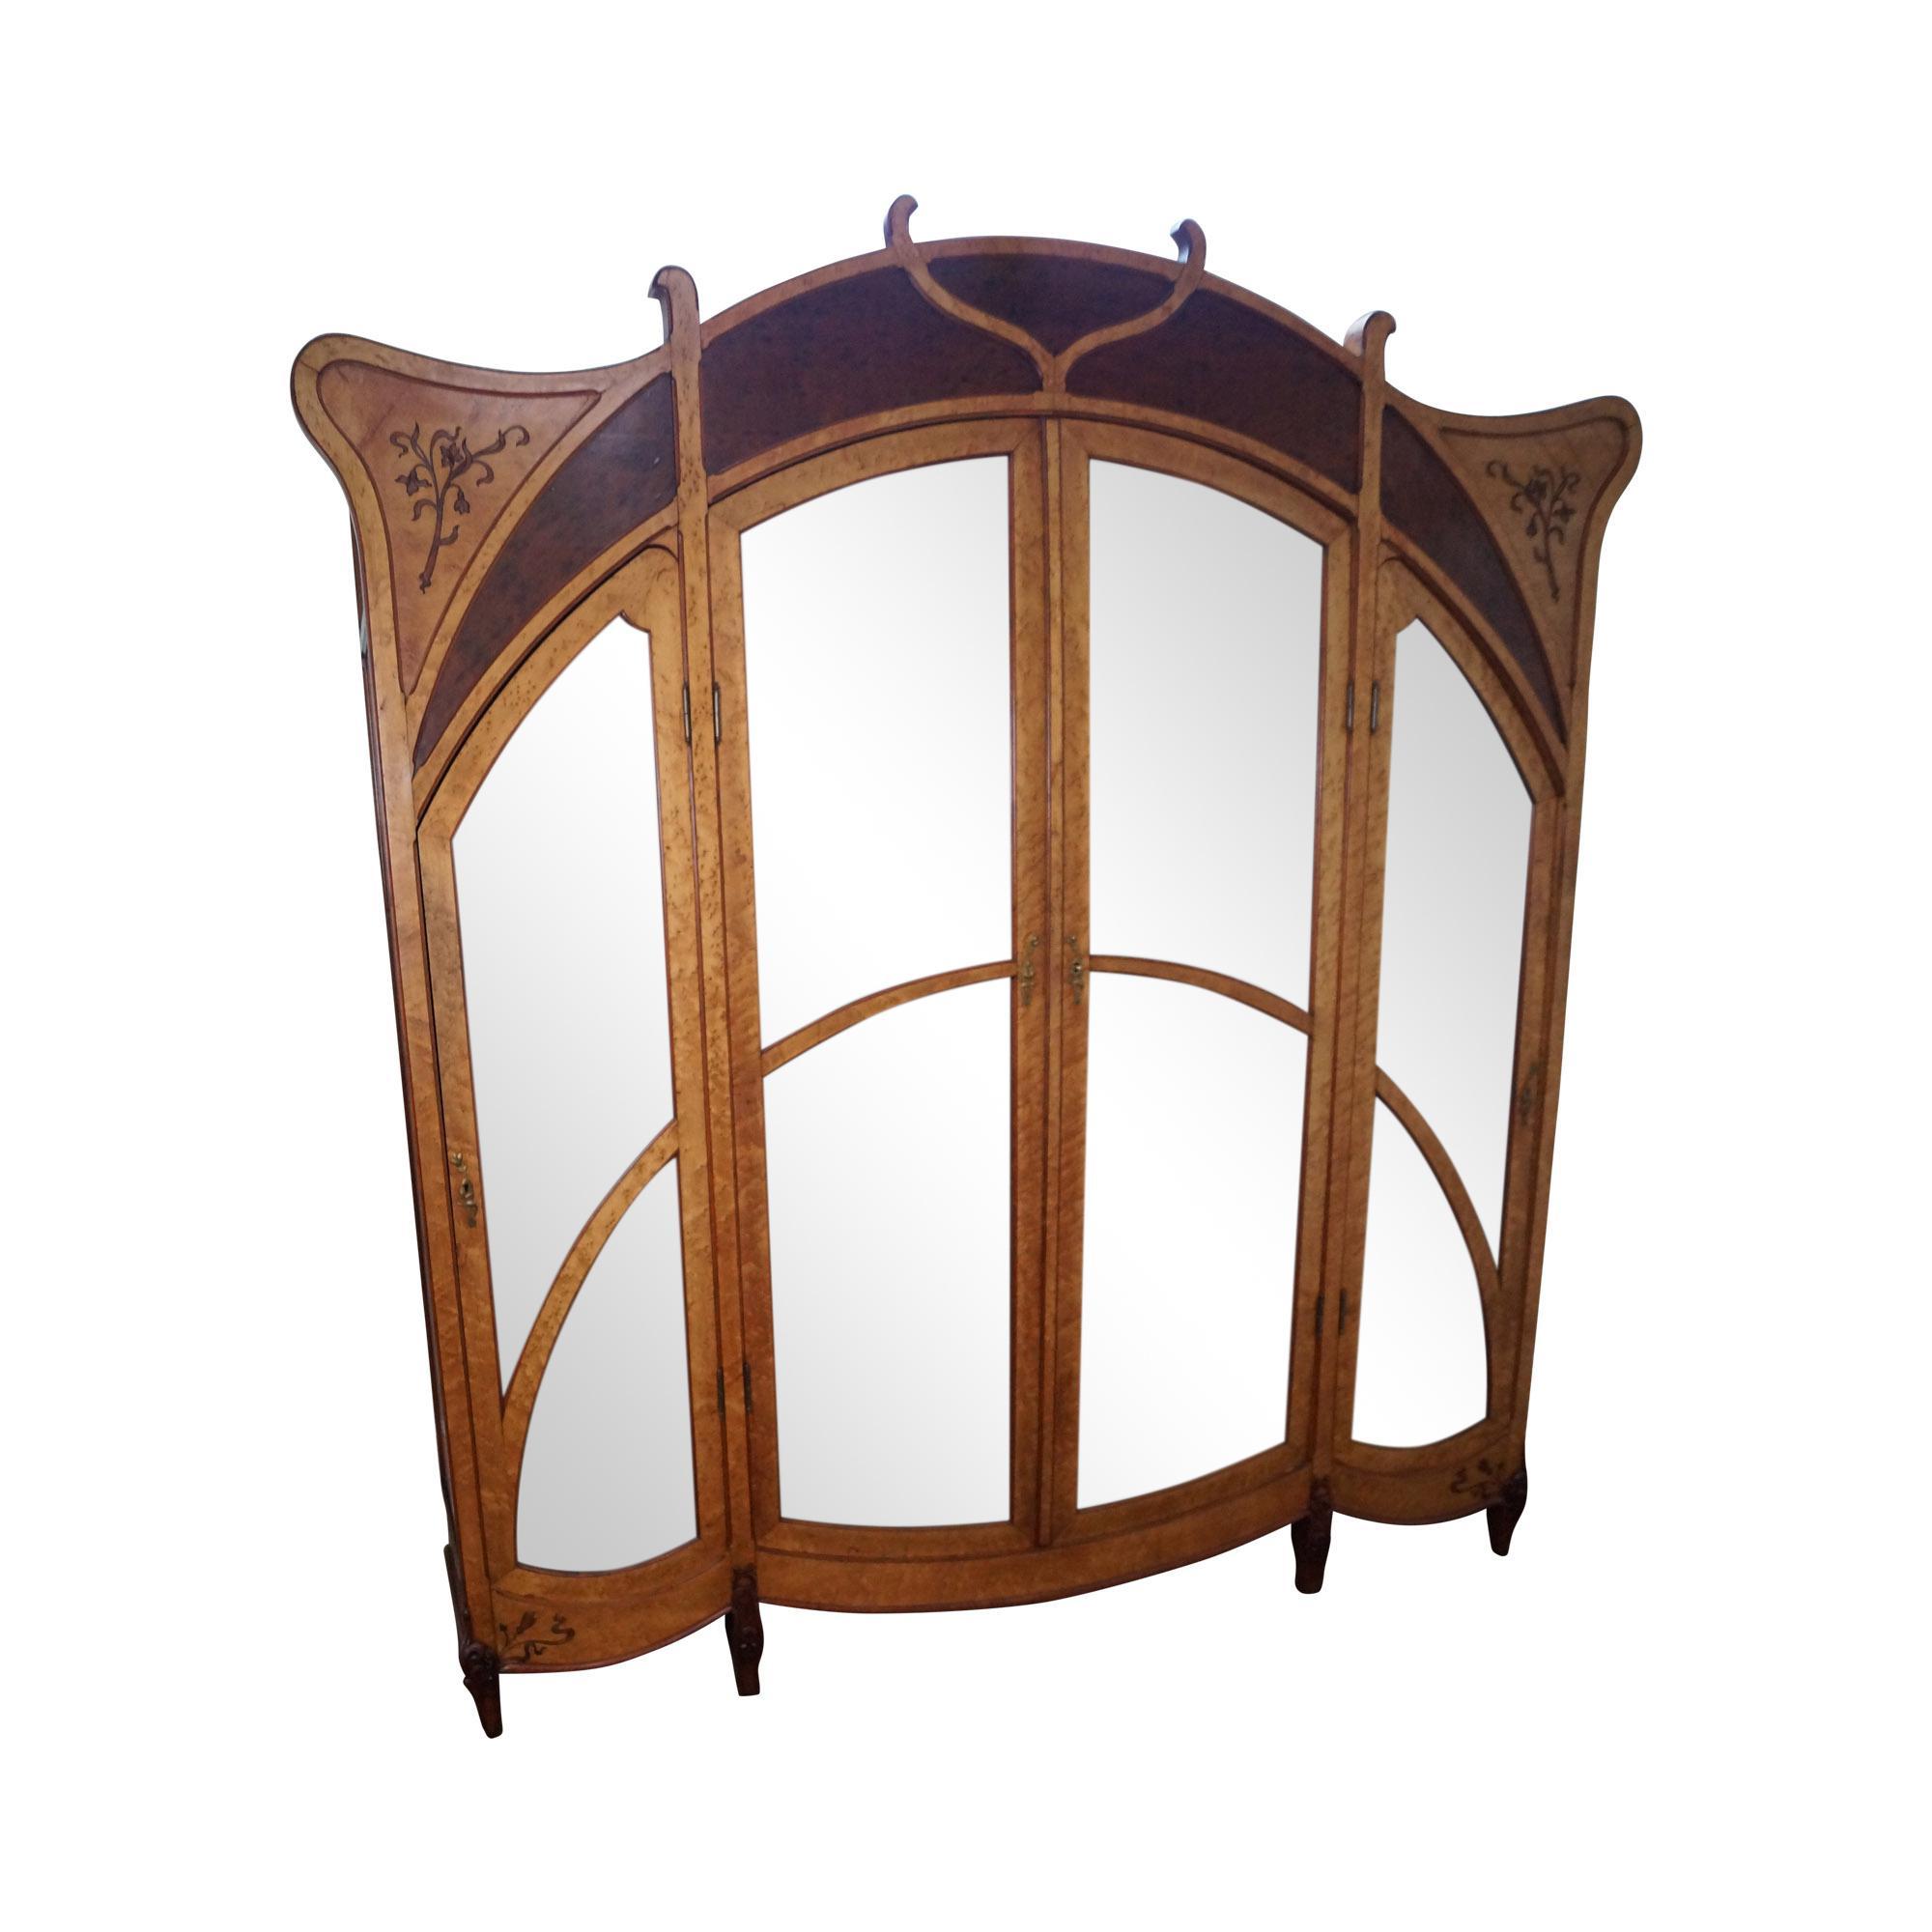 Antique French Art Nouveau Birdseye Maple U0026 Walnut Armoire